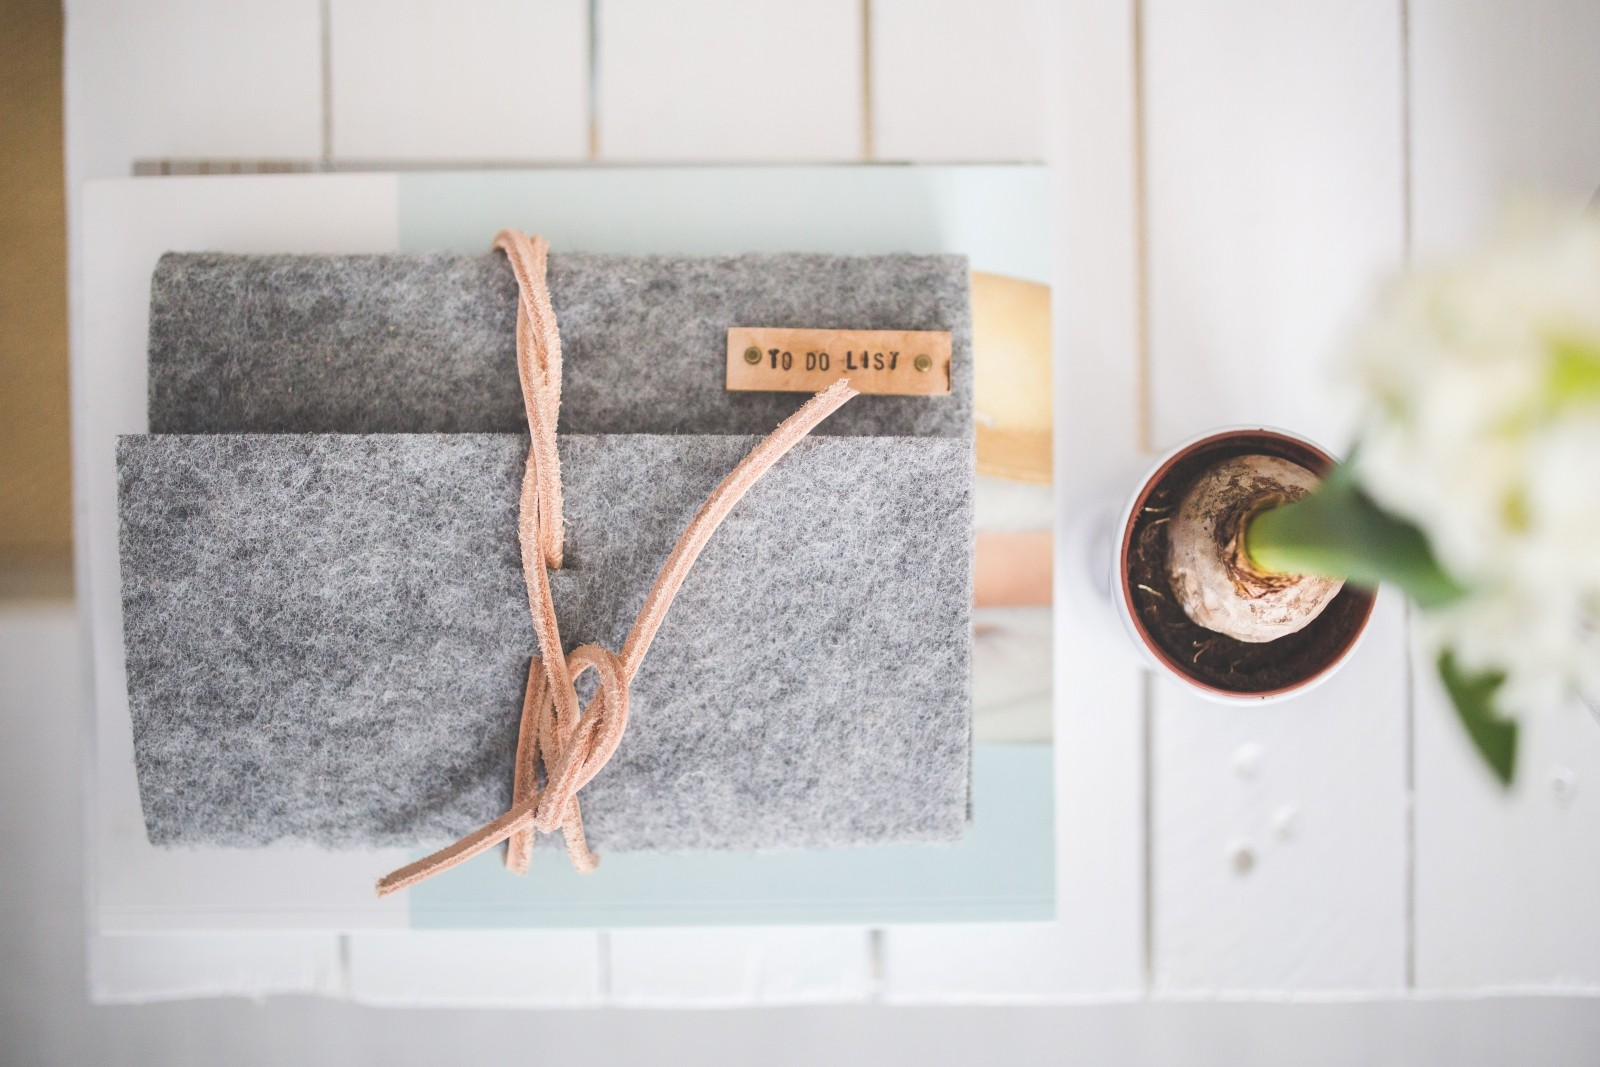 grey-felt-journal-to-do-list-on-a-white-desk